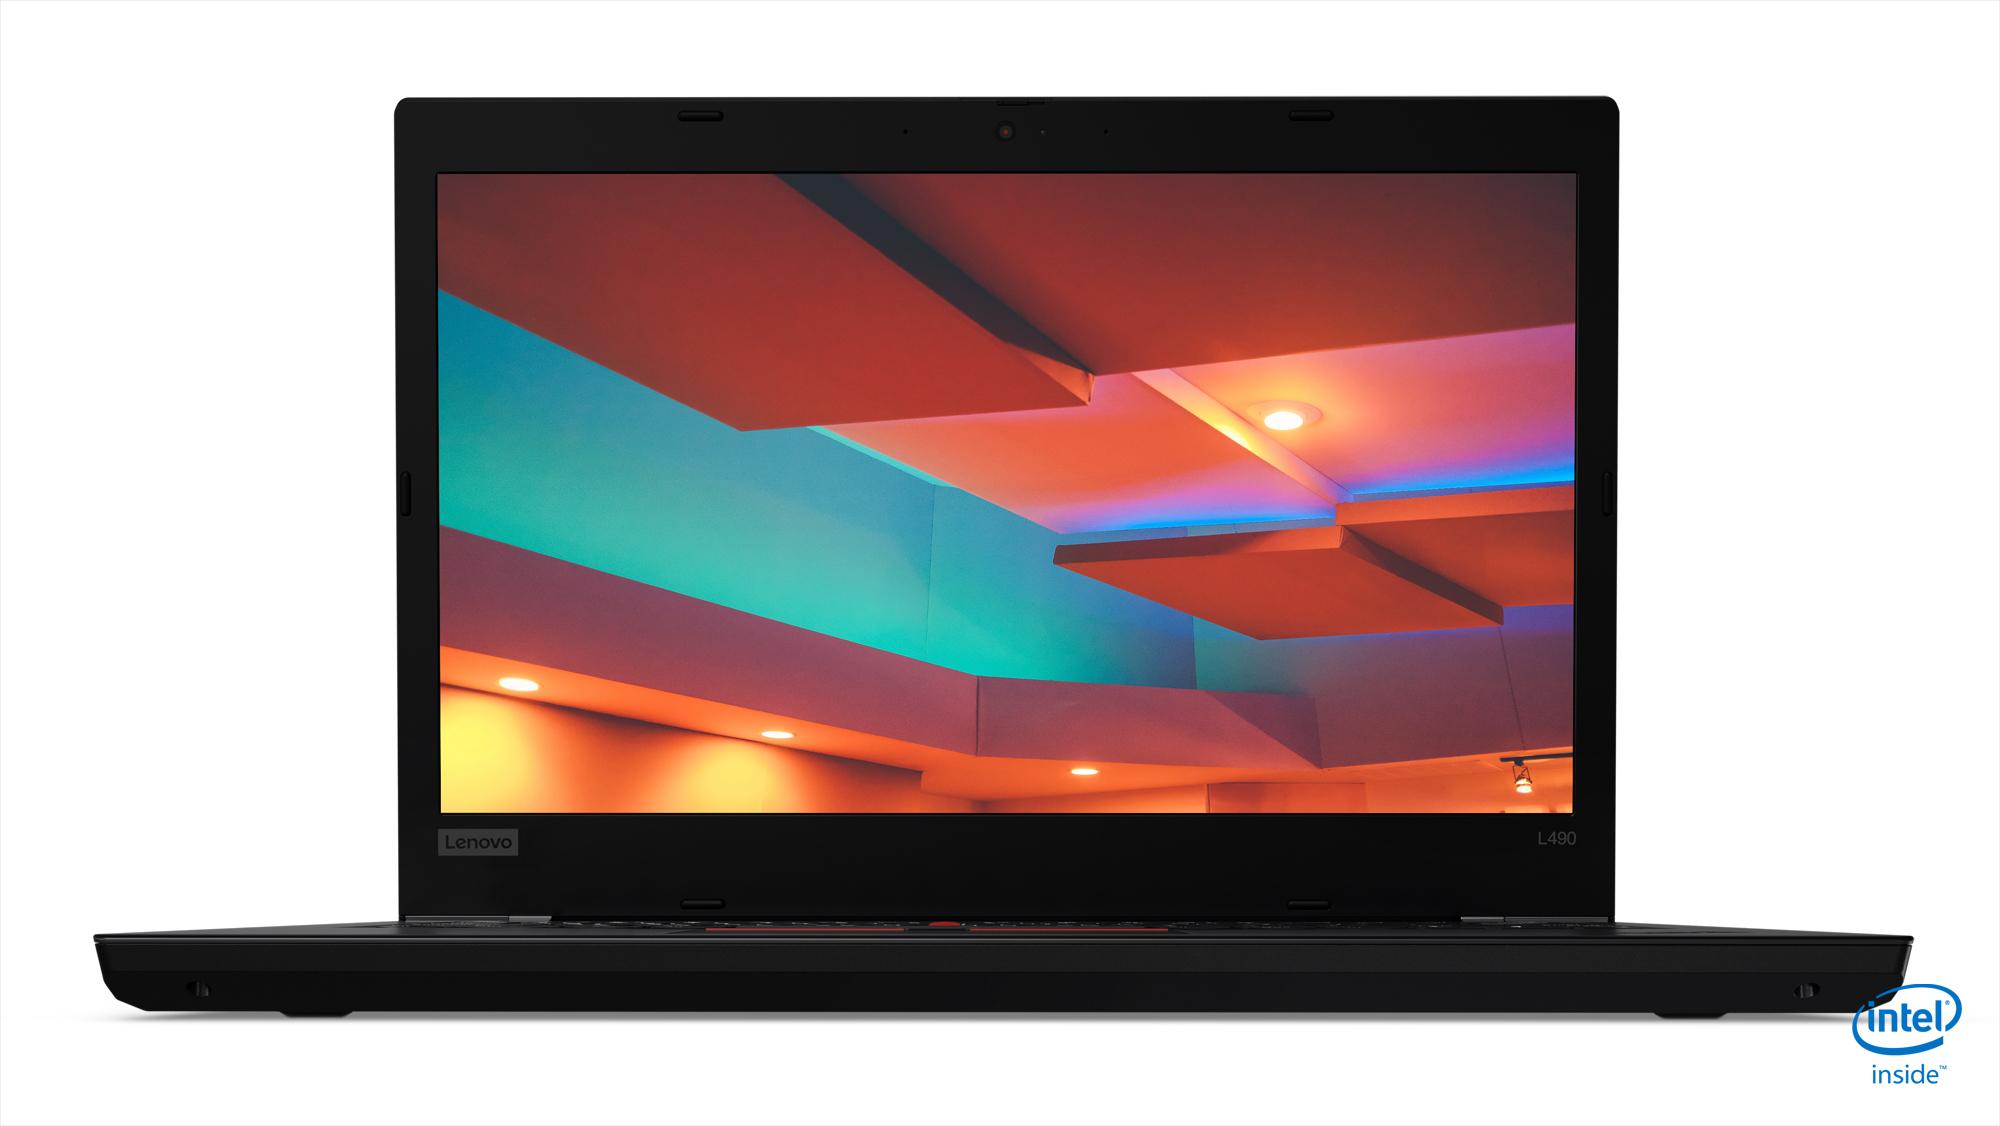 "Lenovo ThinkPad L490 Portátil Negro 35,6 cm (14"") 1920 x 1080 Pixeles 8ª generación de procesadores Intel® Core™ i7 8 GB DDR4-SDRAM 256 GB SSD Wi-Fi 5 (802.11ac) Windows 10 Pro"